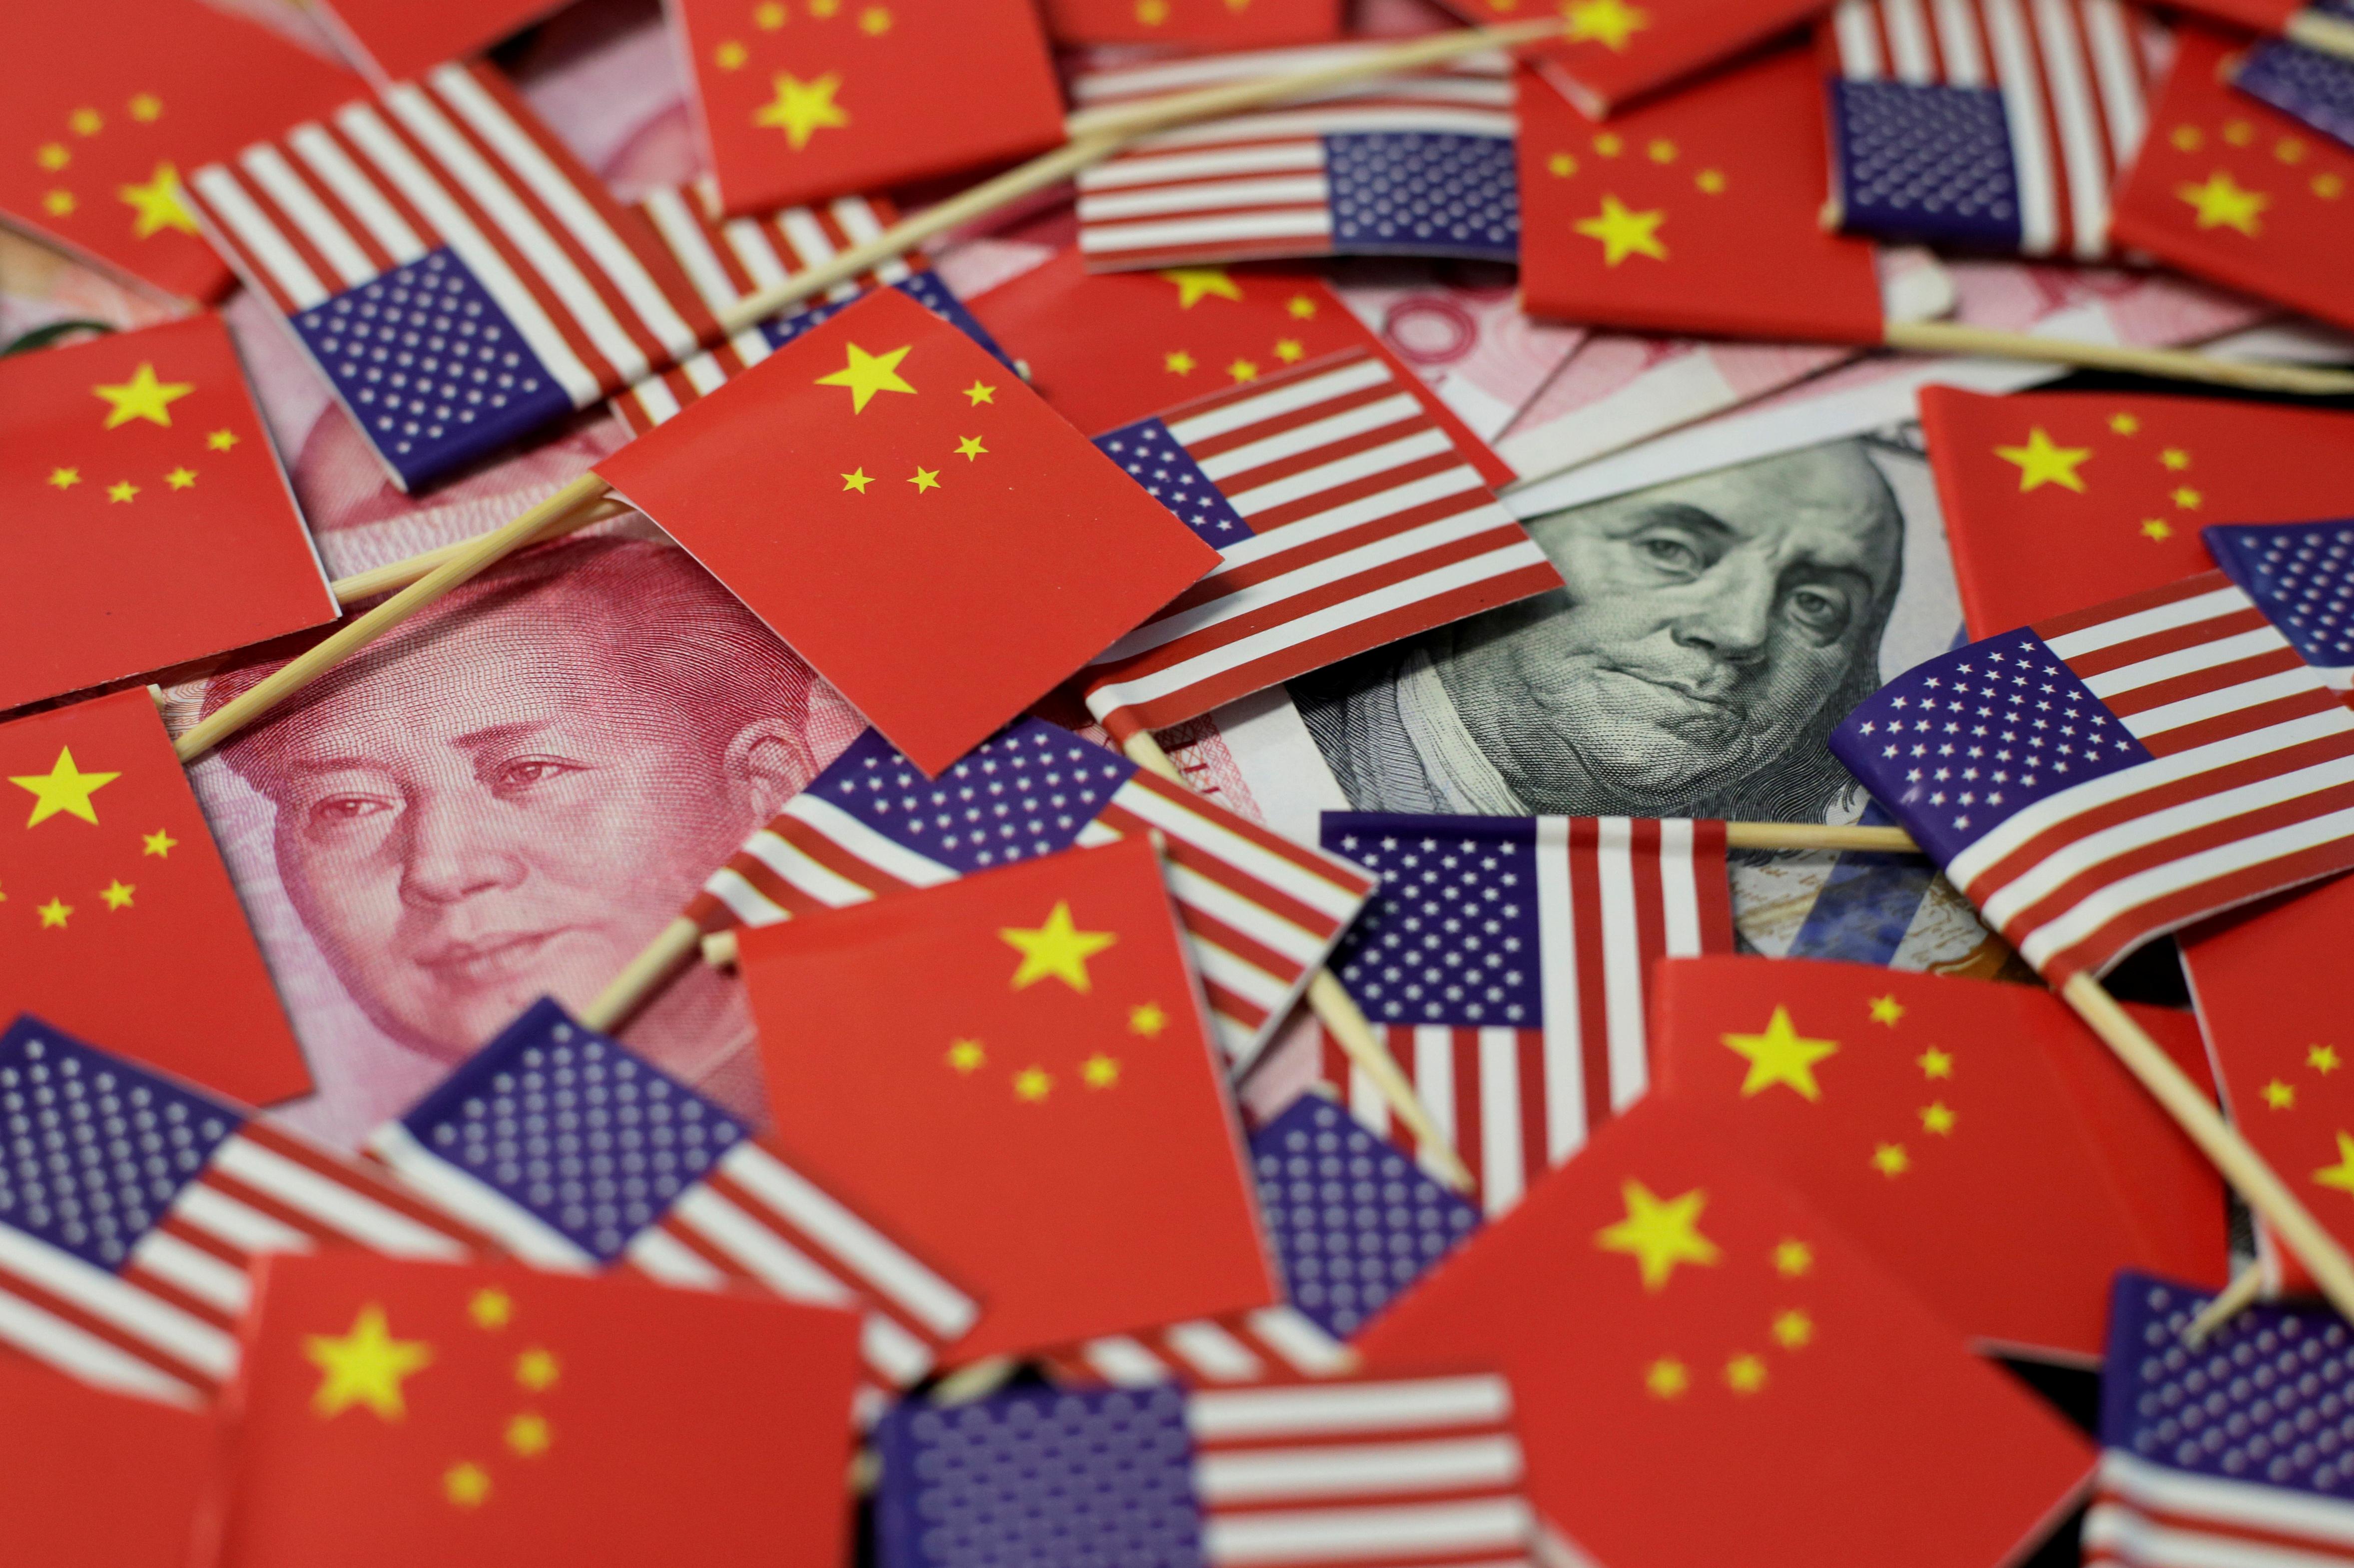 la-chine-va-taxer-75-milliards-de-dollars-de-produits-americains